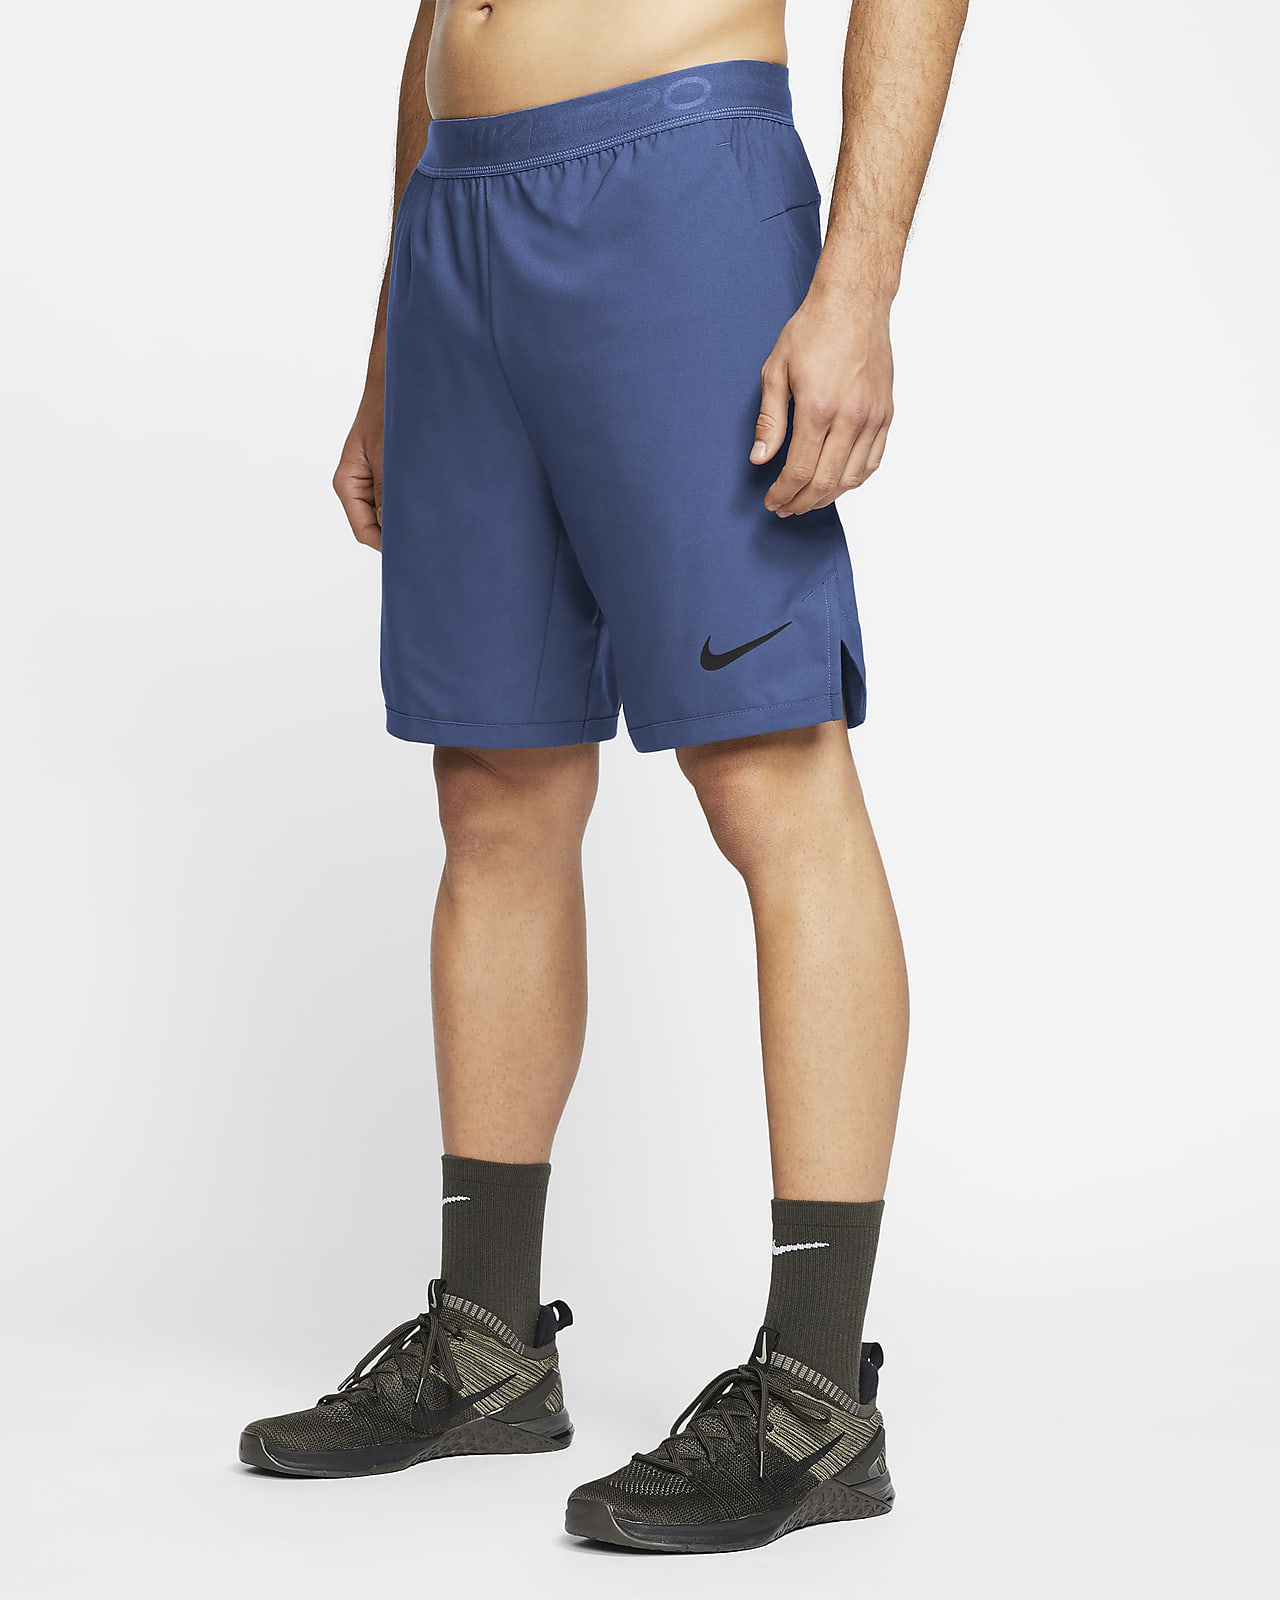 Nike Pro Flex Vent Max Herrenshorts